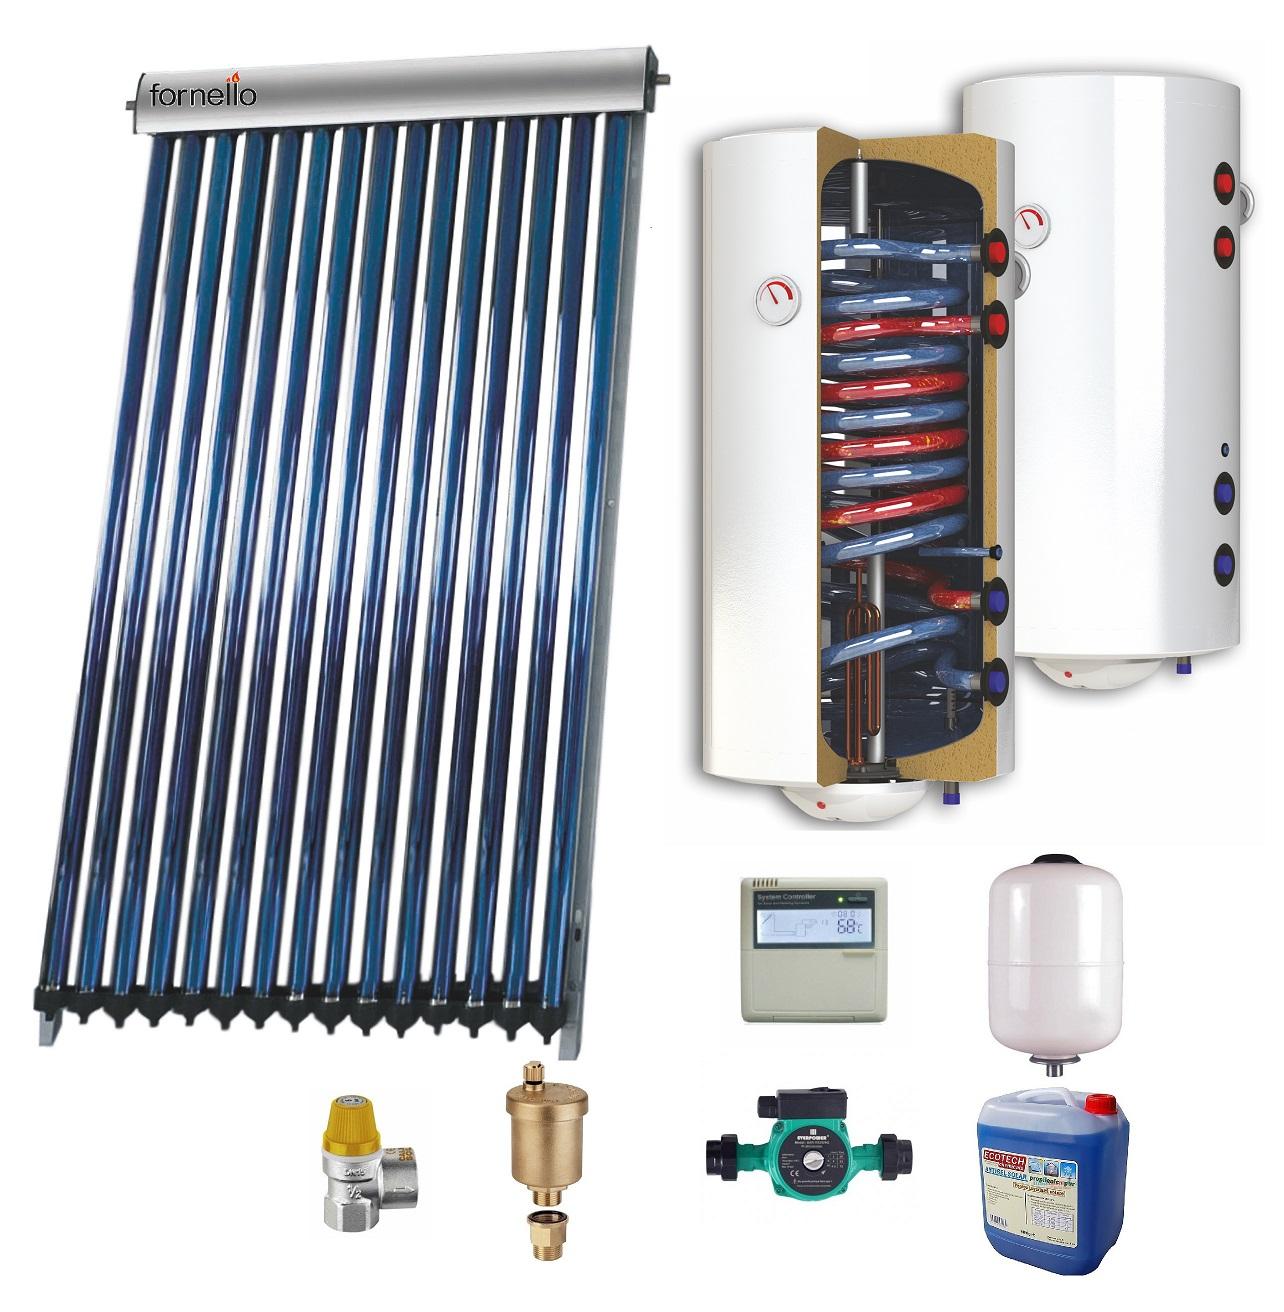 Sistem solar presurizat , panou Sunsystem VTC 15, boiler cu 2 serpentine si rezistenta electrica Sunsystem 120 litri, pompa 25-60, controller, vas expansiune, antigel, supapa 1/2, aerisitor 1/2 imagine fornello.ro